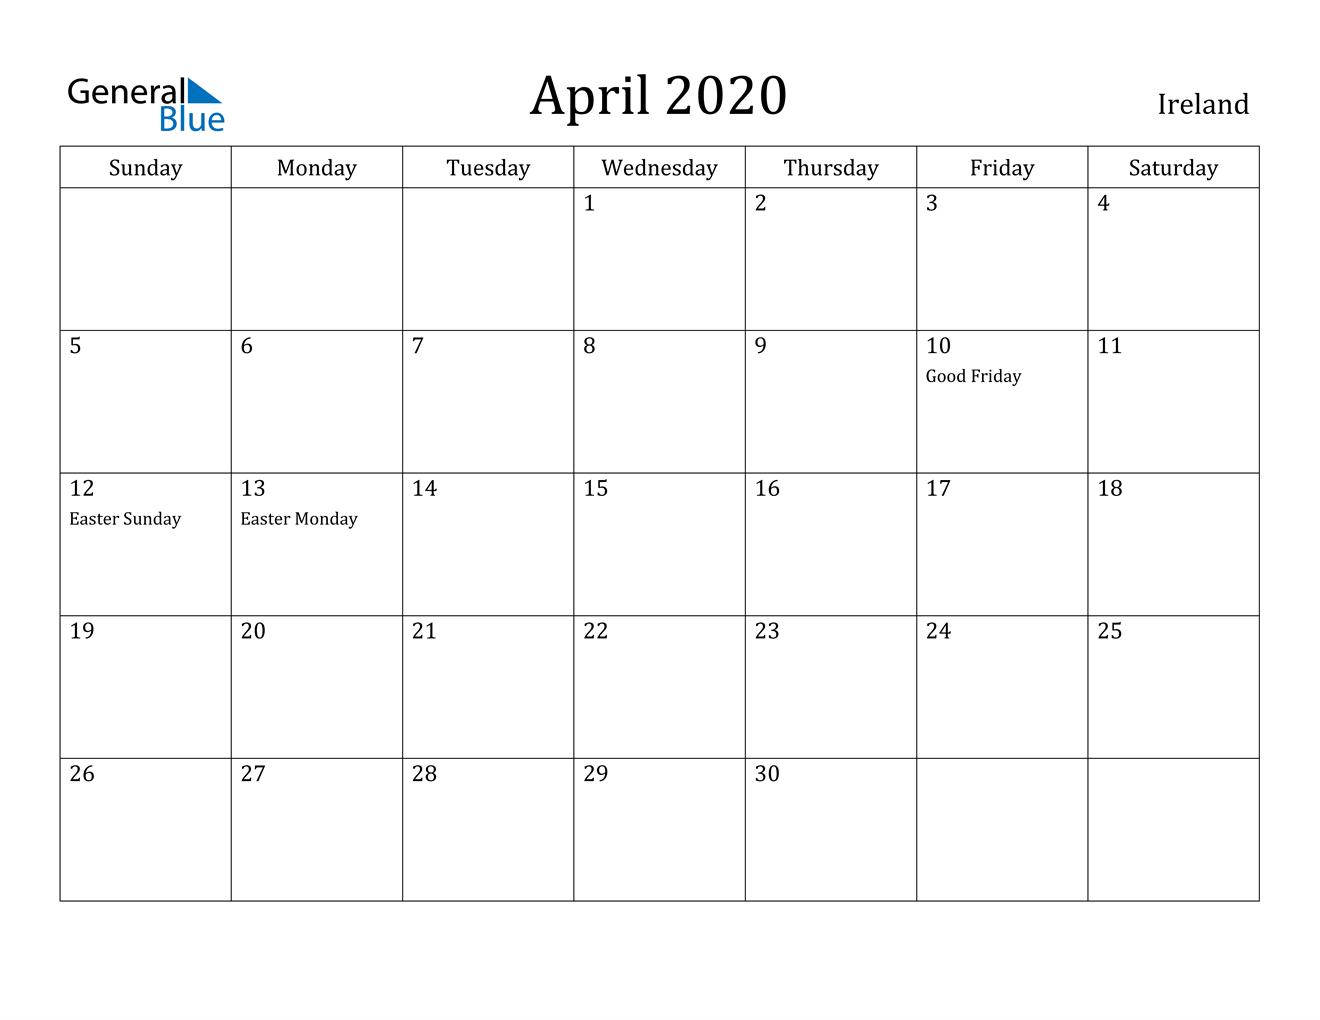 April 2020 Calendar - Ireland